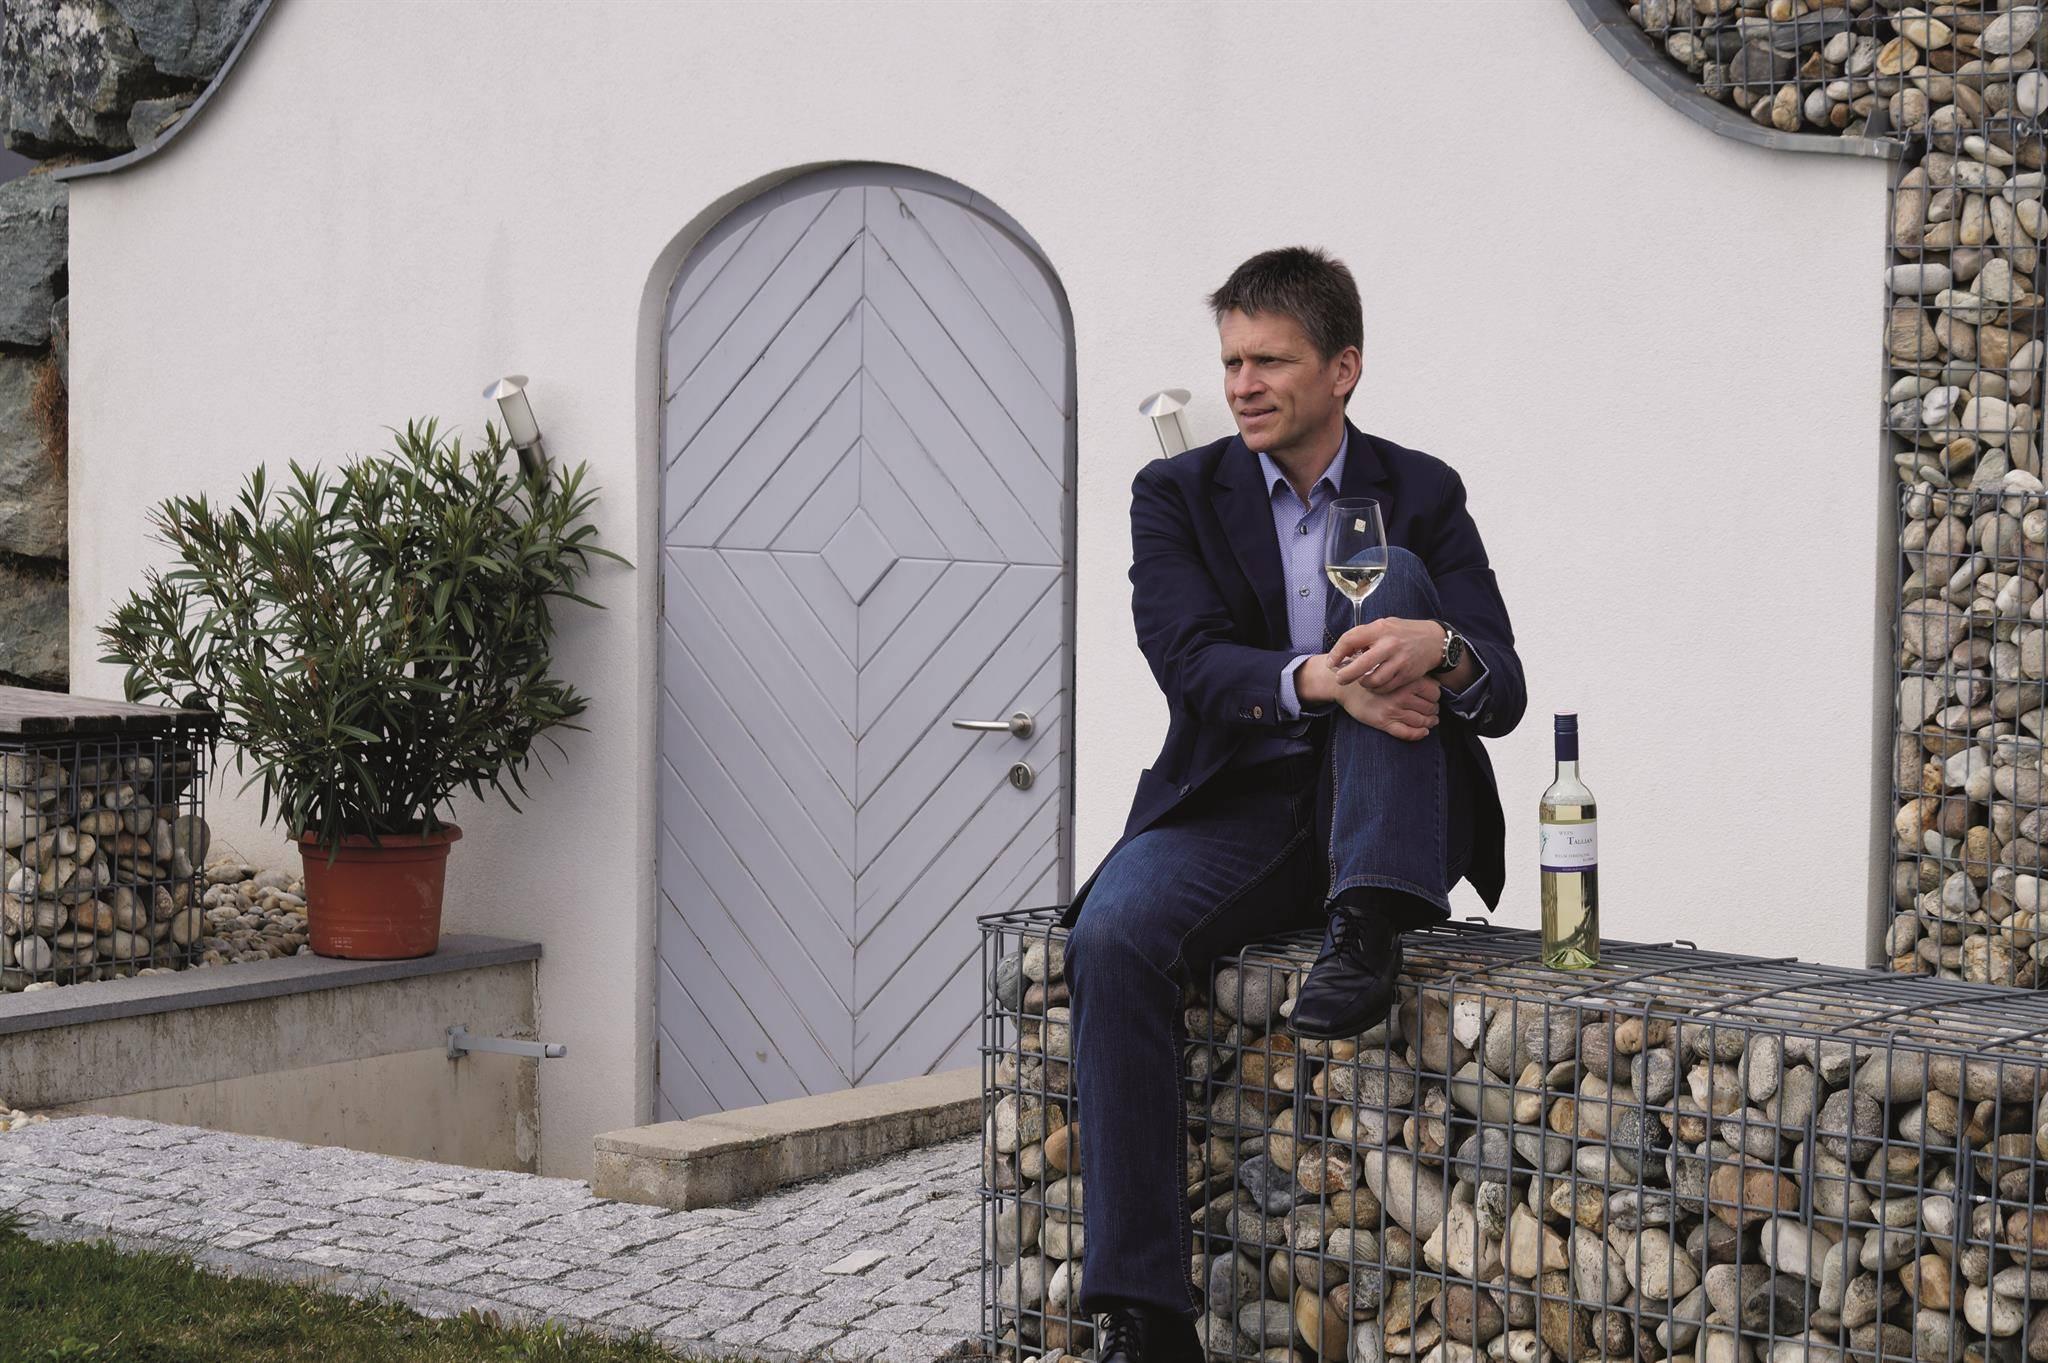 Wein Tallian